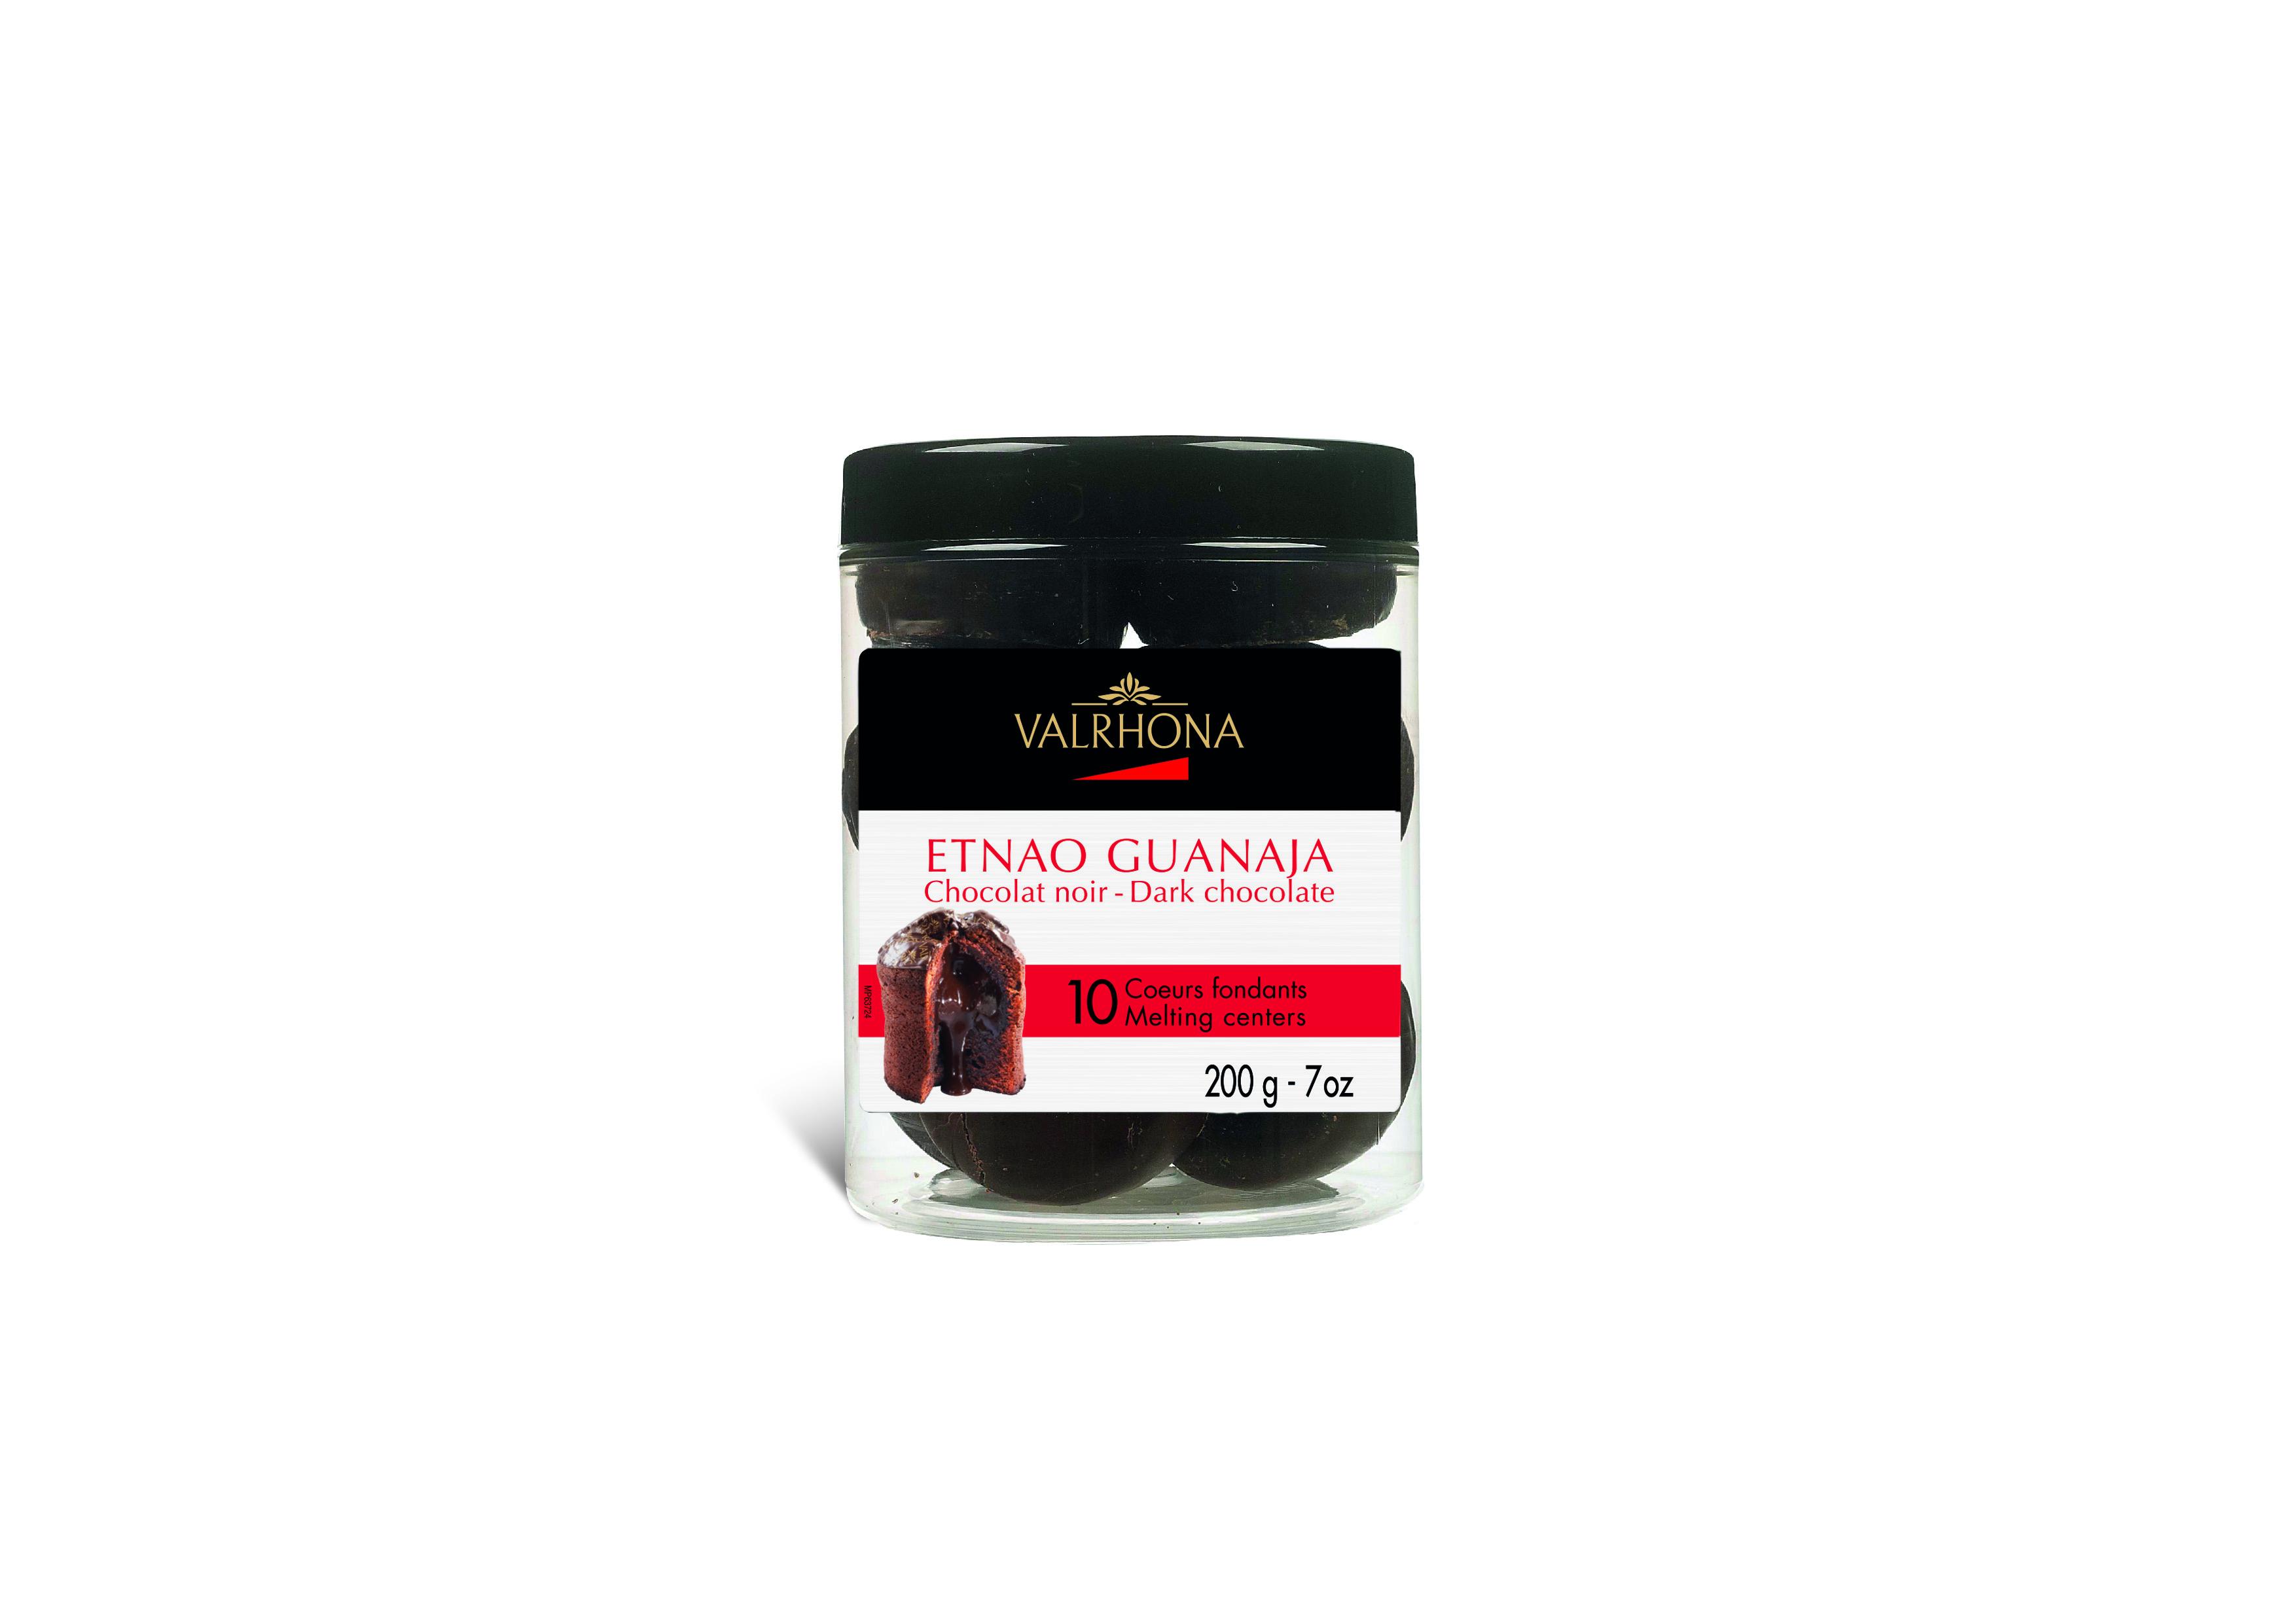 Etnao Guanaja coeurs fondants, Valrhona (180 g)